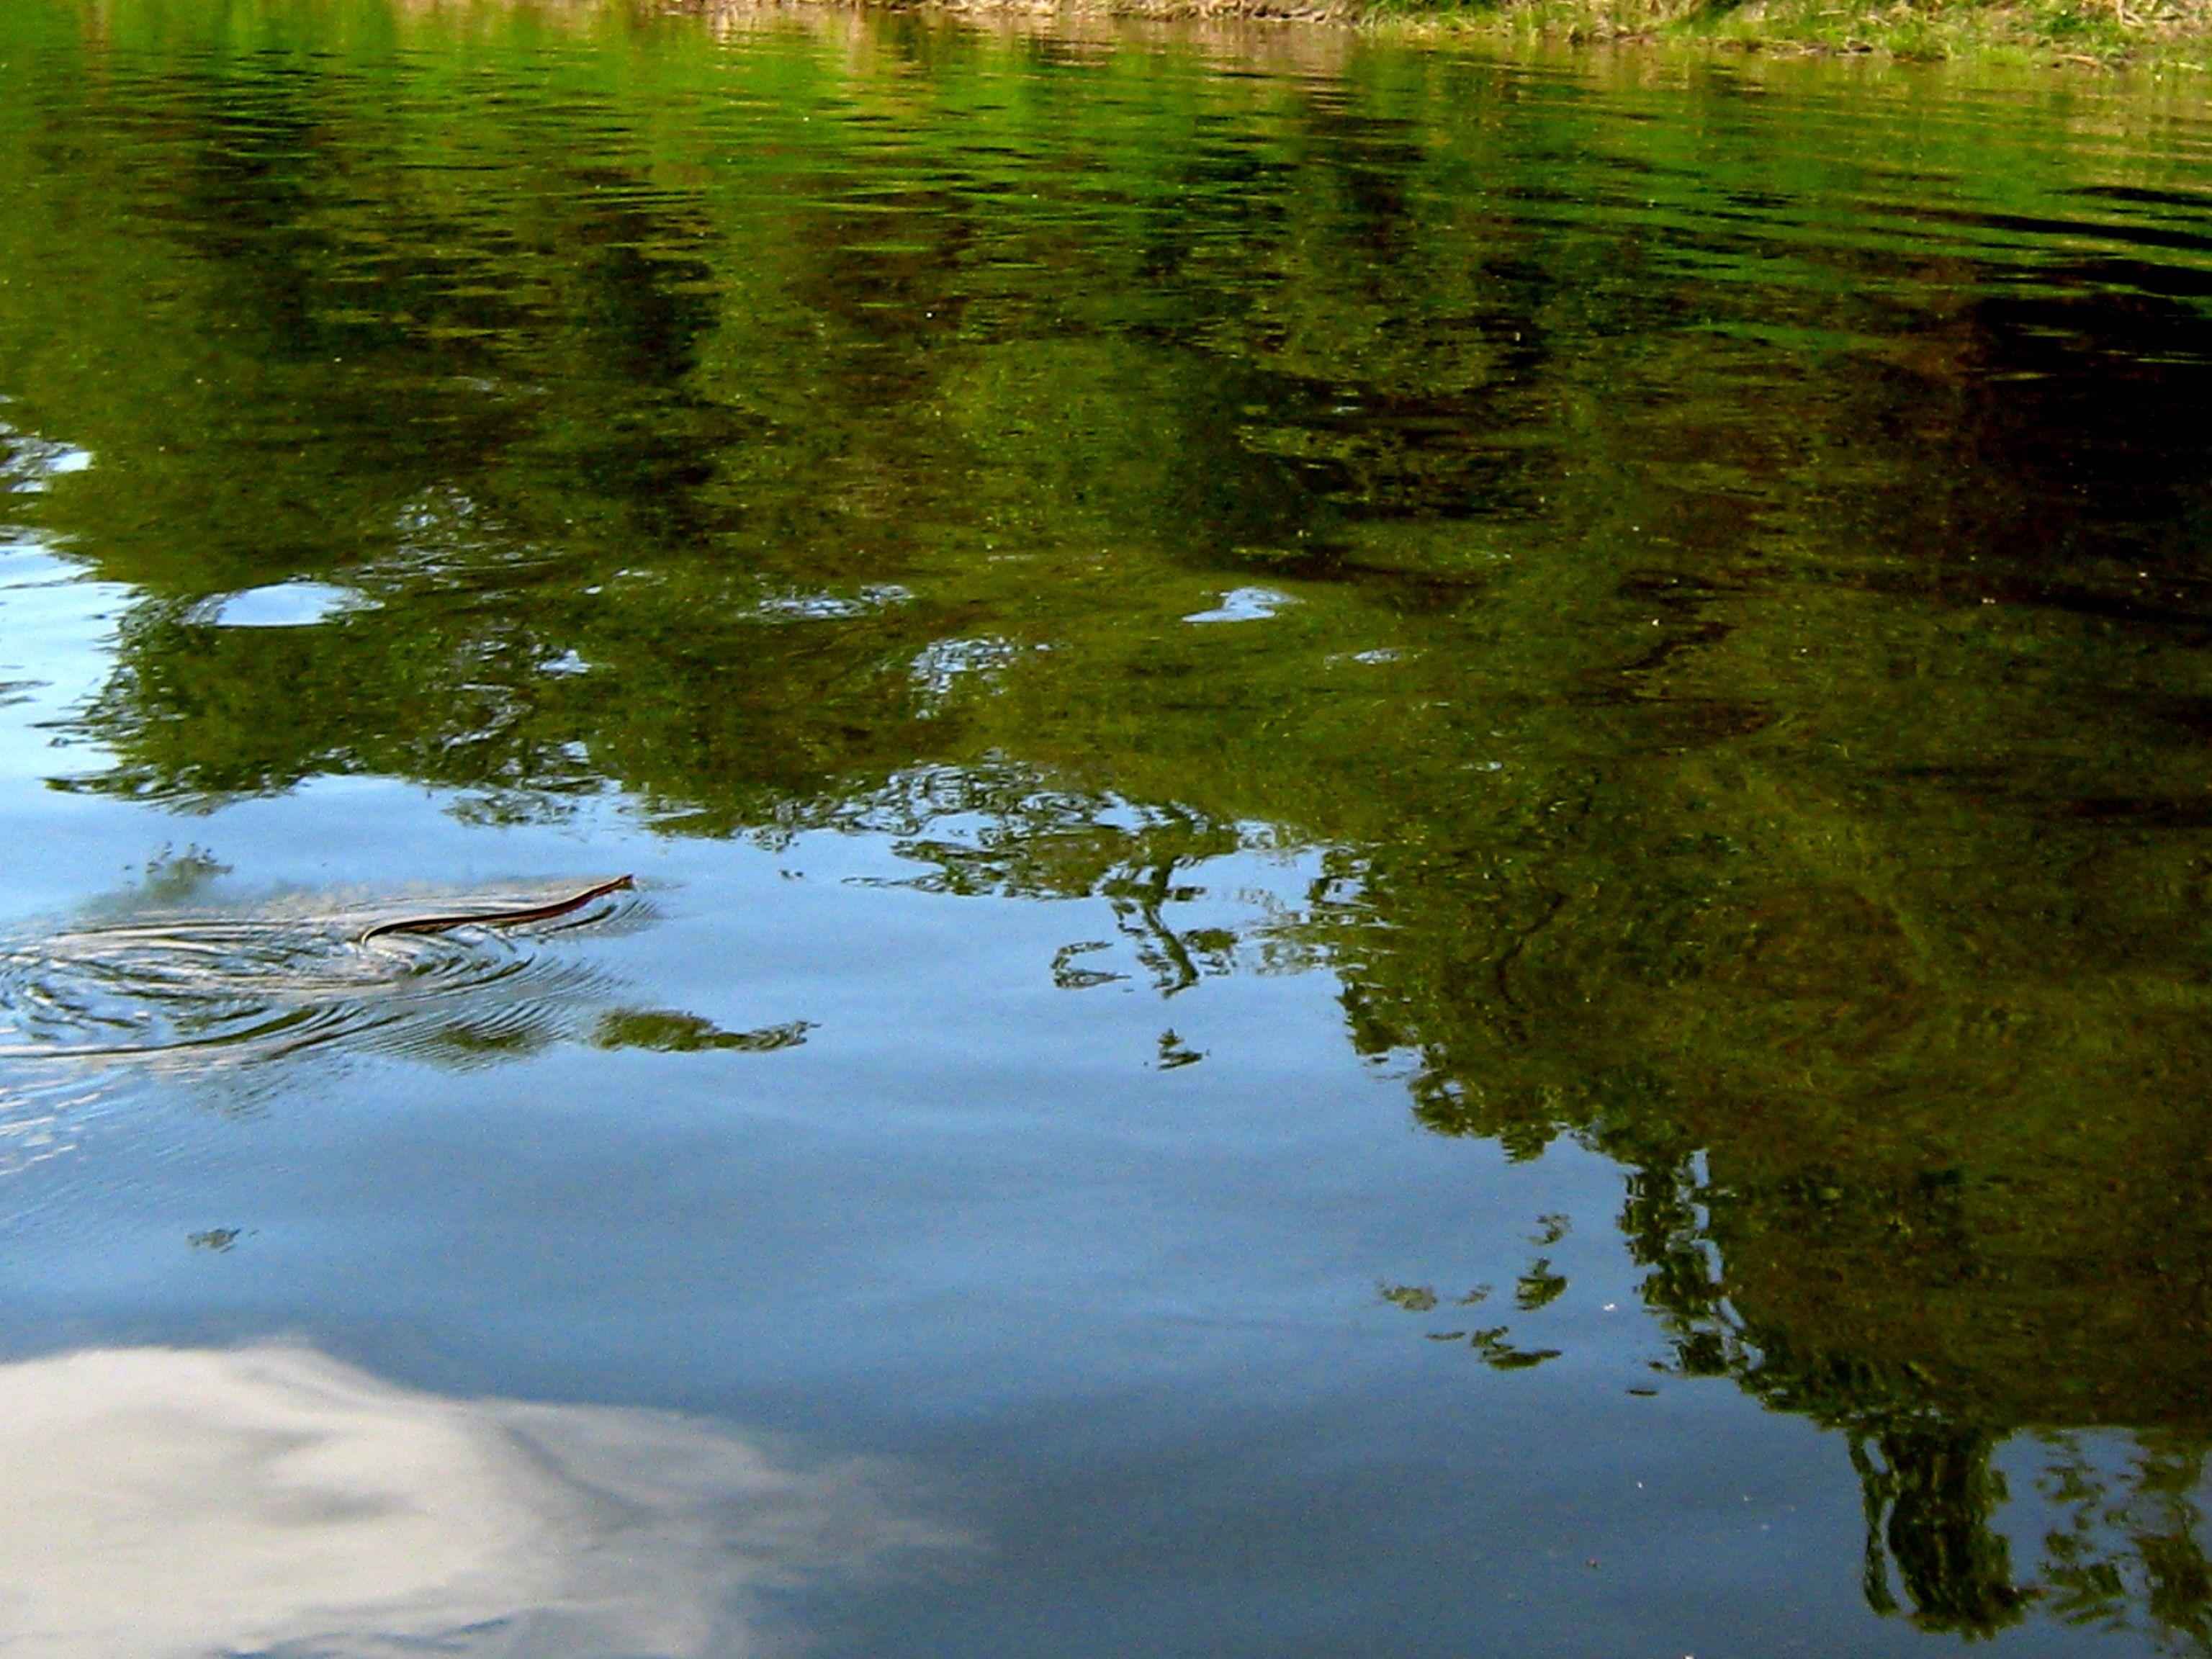 Marathon Rowing: Nechako River; the swimming snake